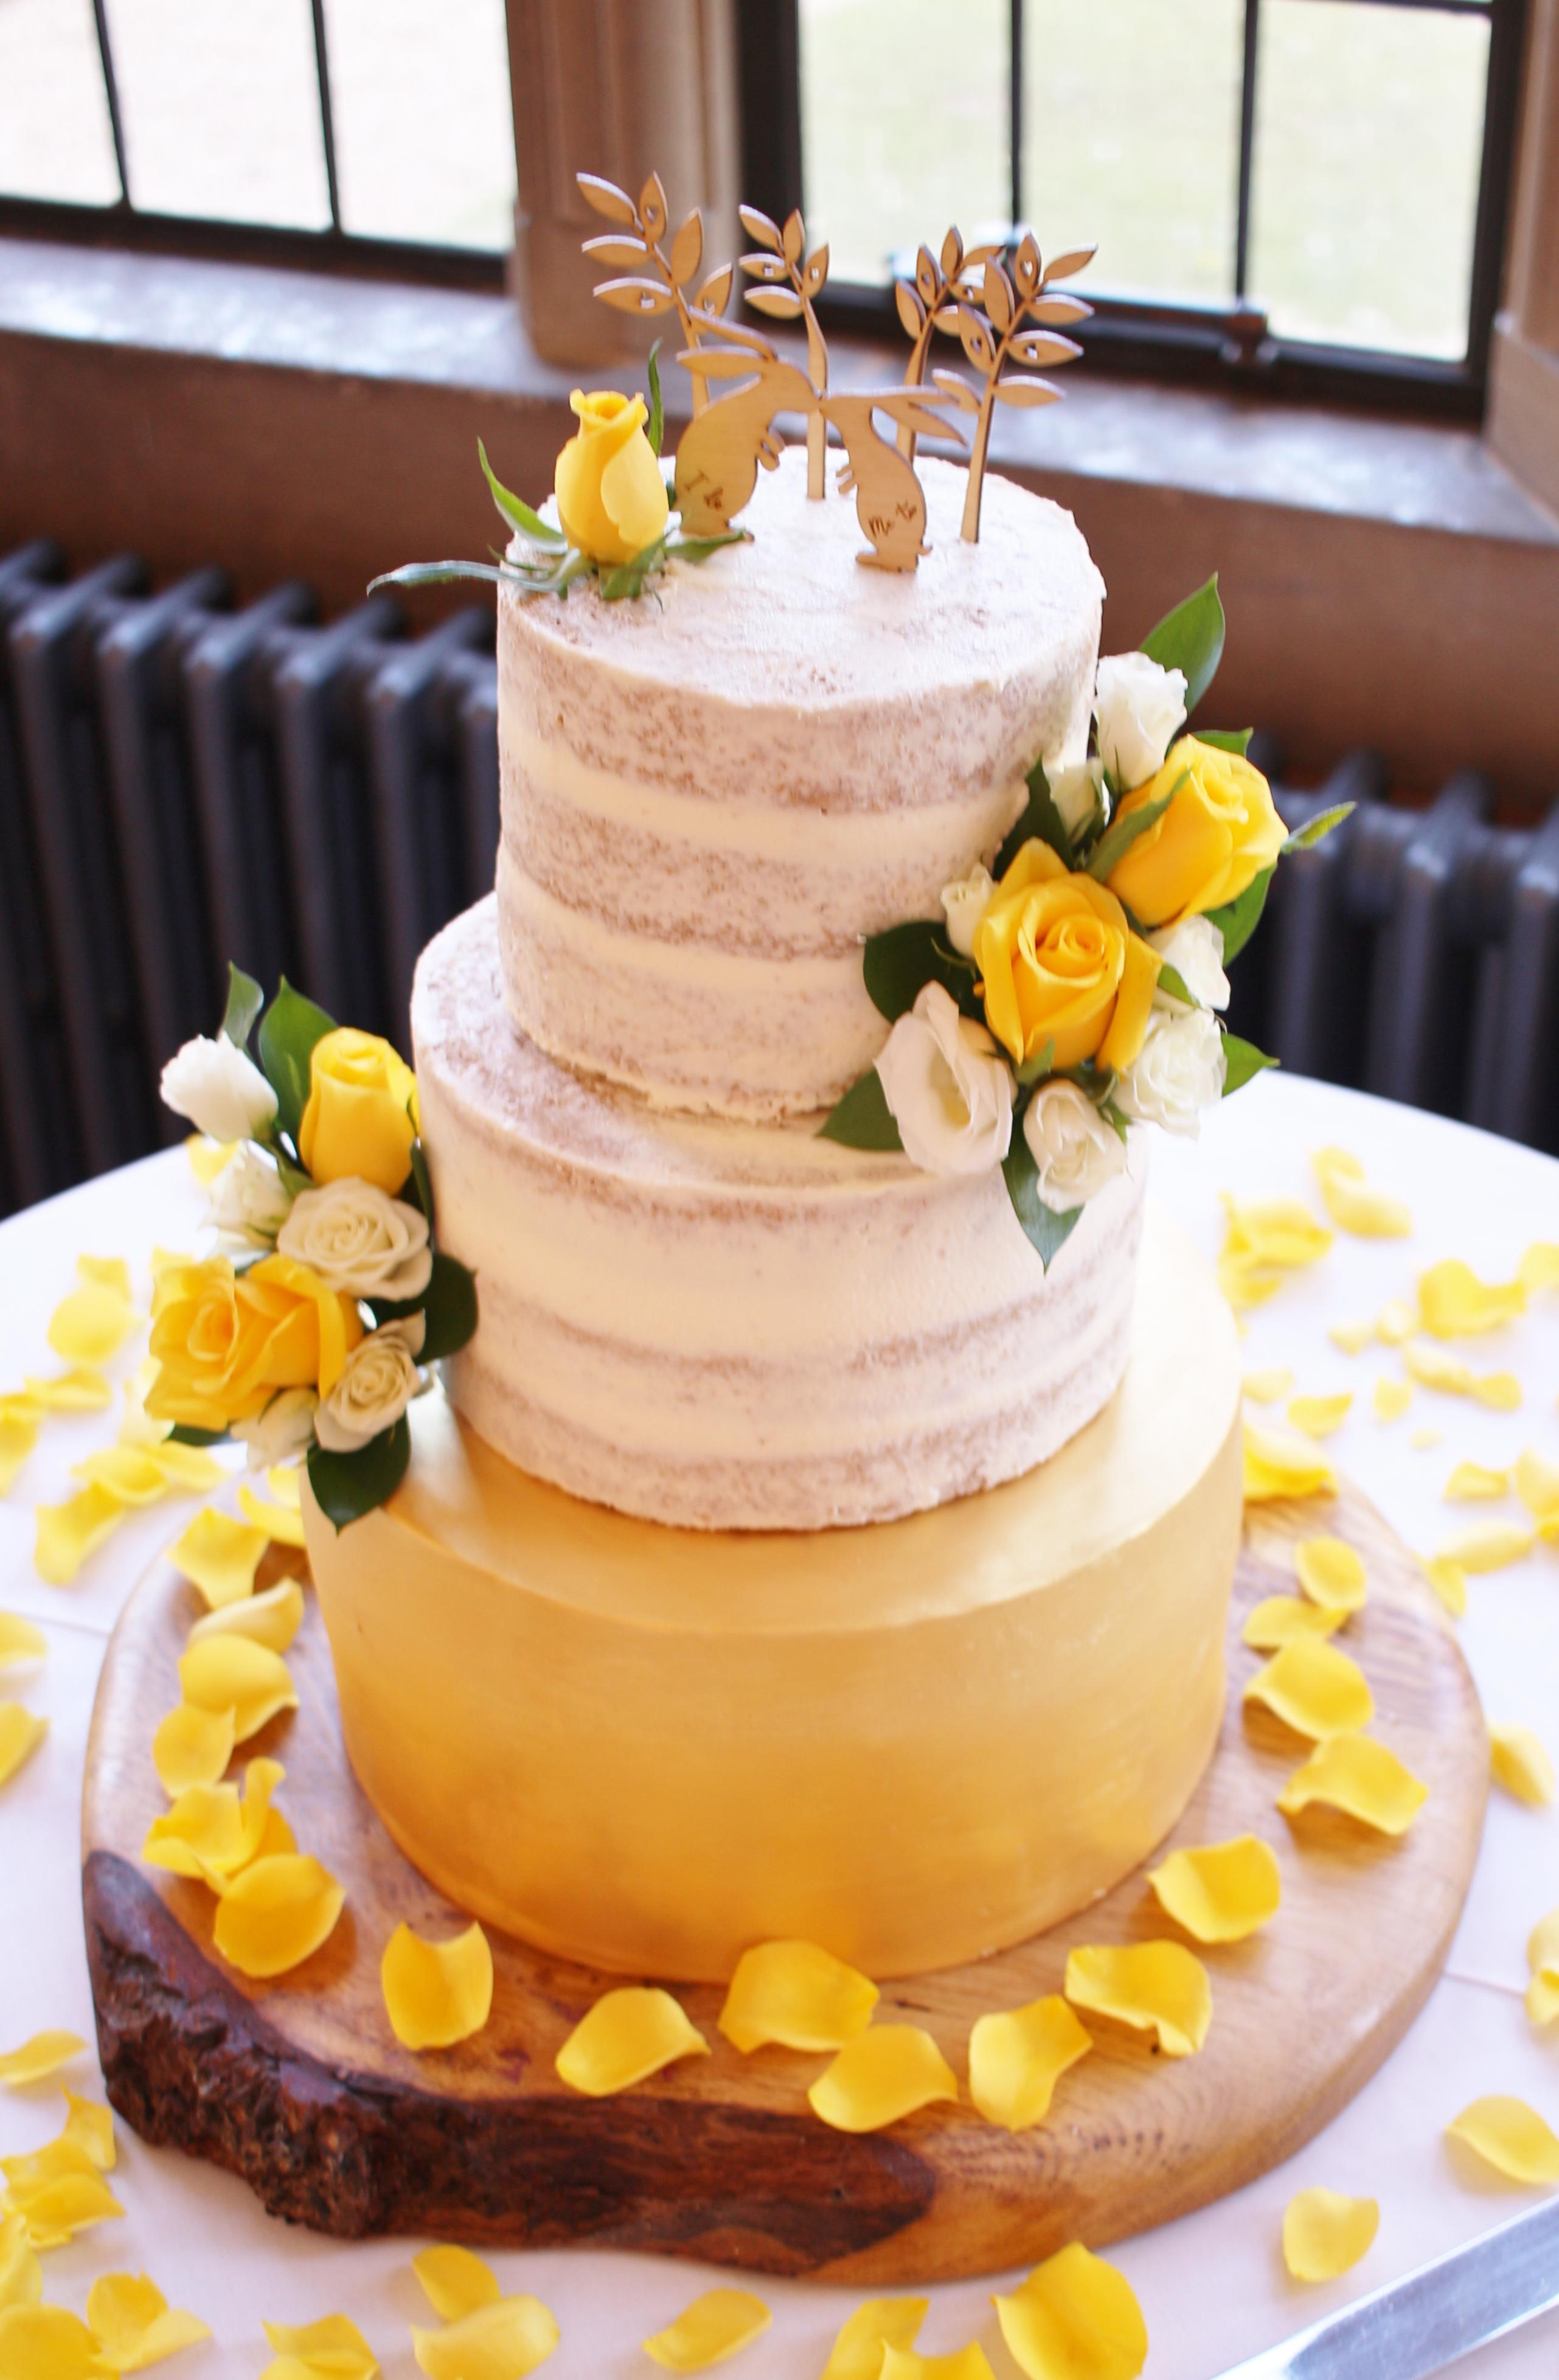 Gold tier semi-naked wedding cake